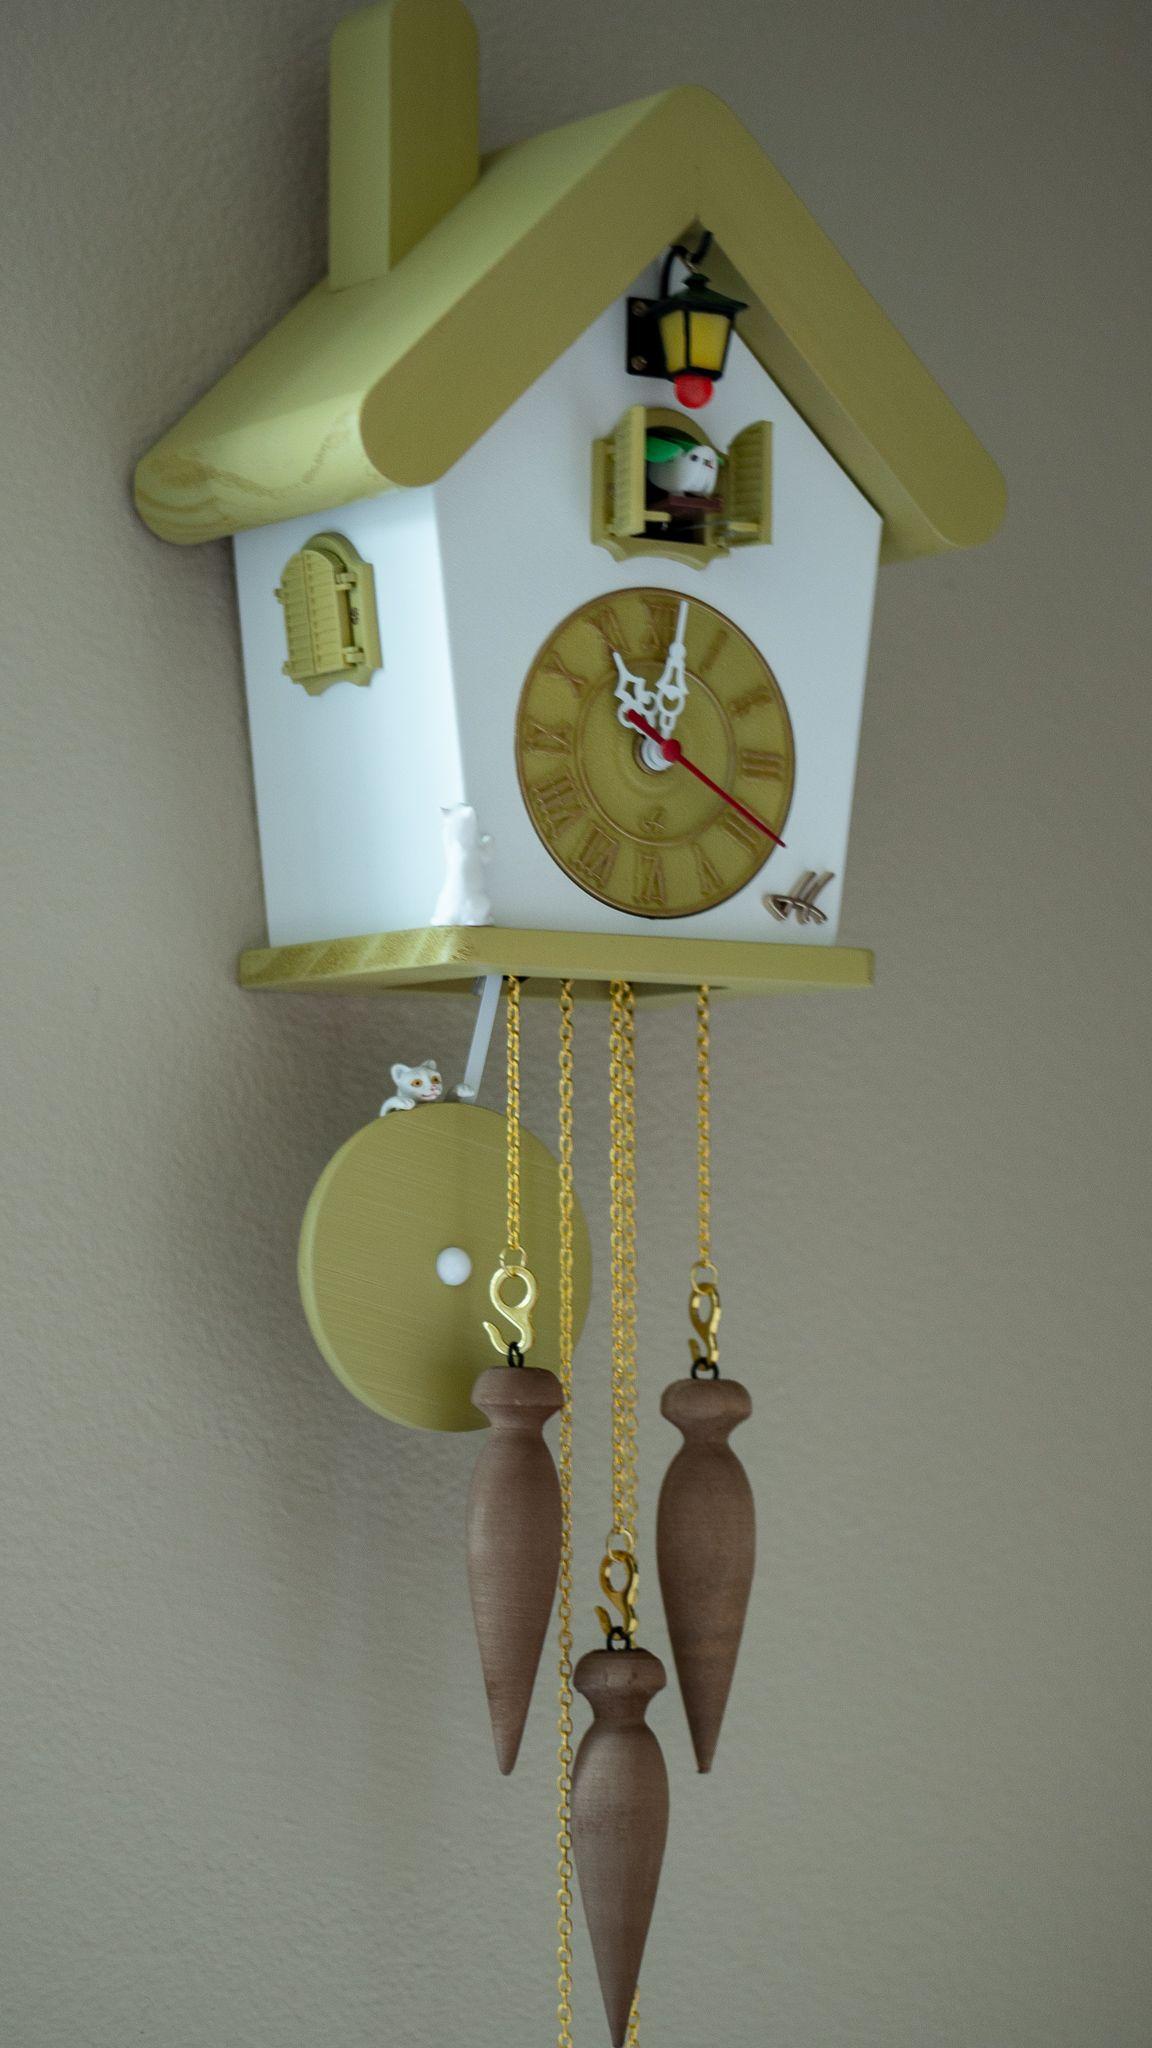 Cuckoo Clockwall Clockhand Madeclock Kitchen Wall Etsy In 2020 Cuckoo Clock Modern Cuckoo Clocks Diy Clock Wall